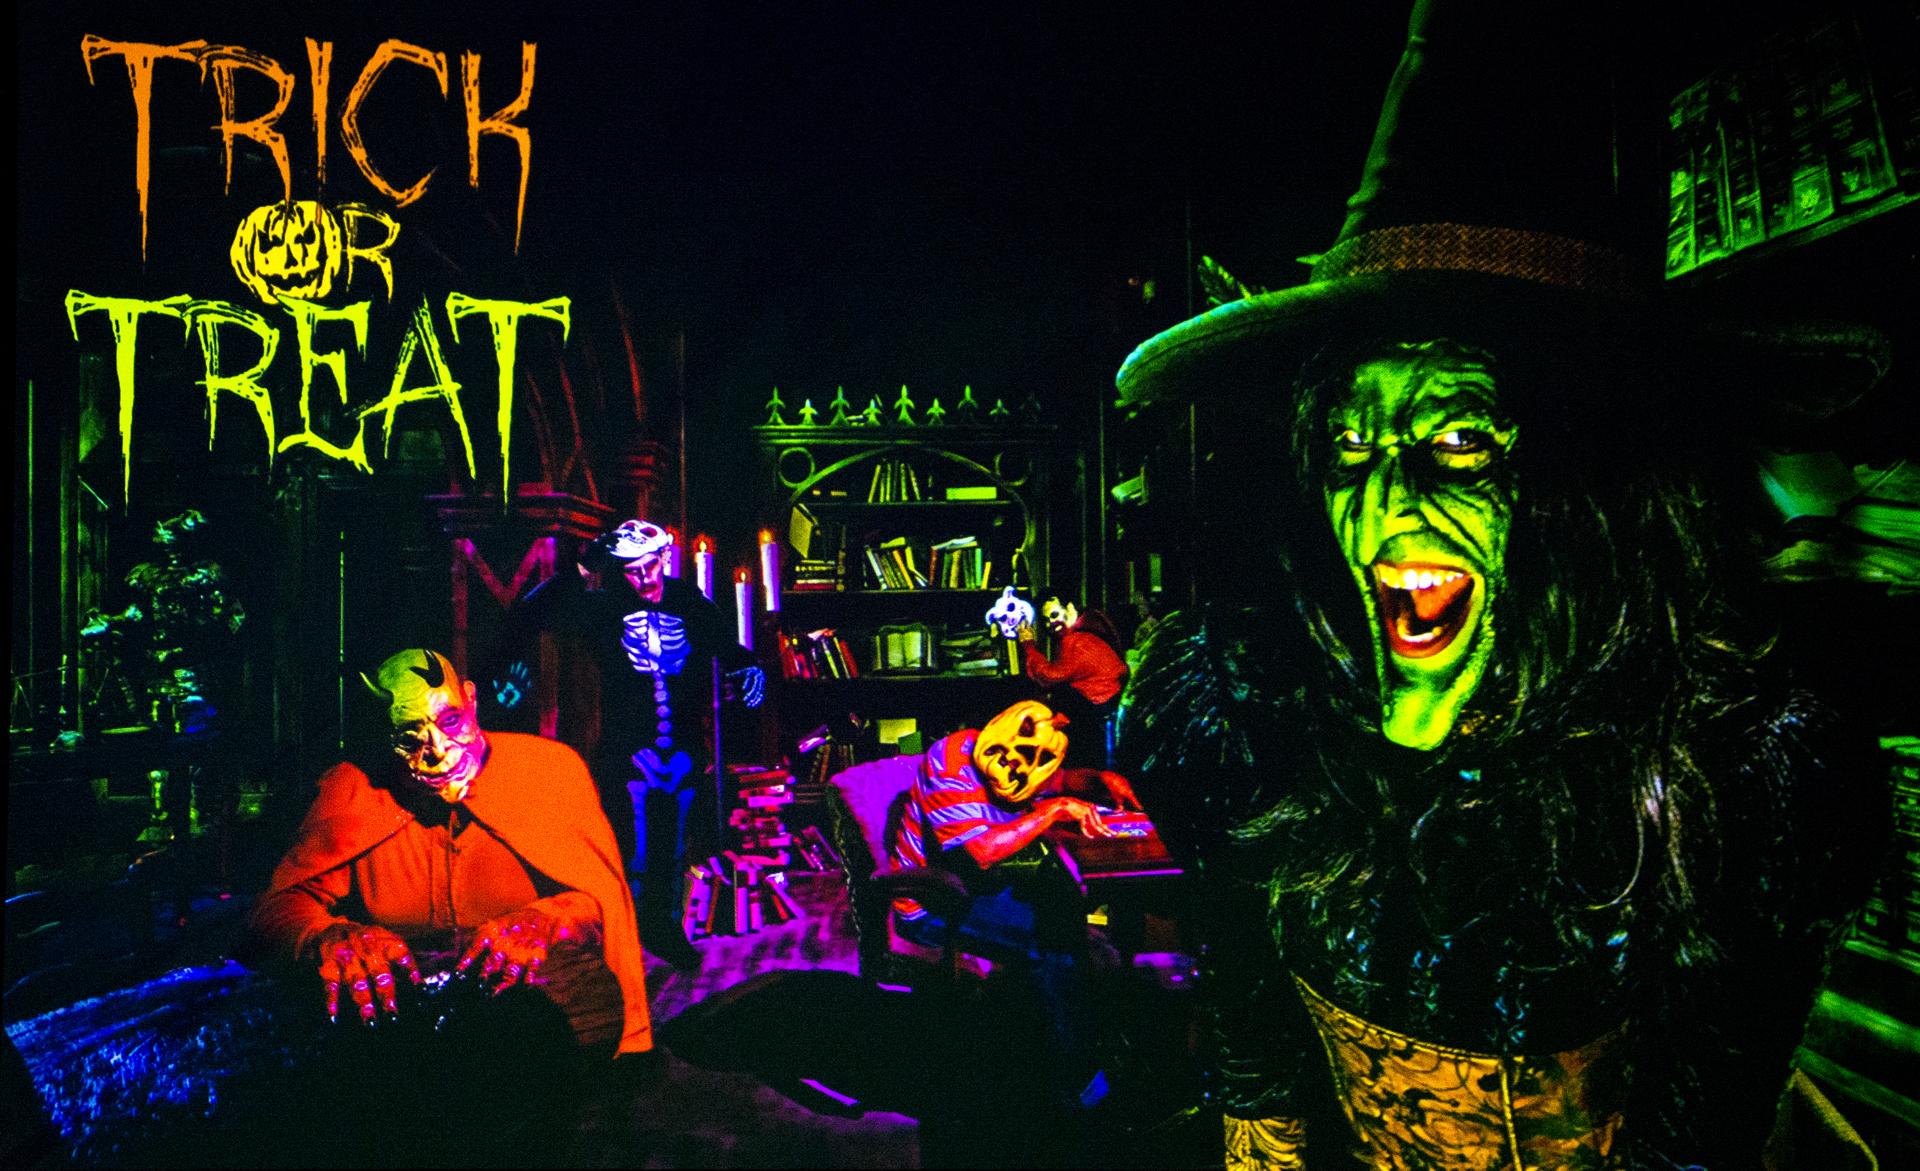 Trick or Treat (Image courtesy of Knott's Scary Farm)